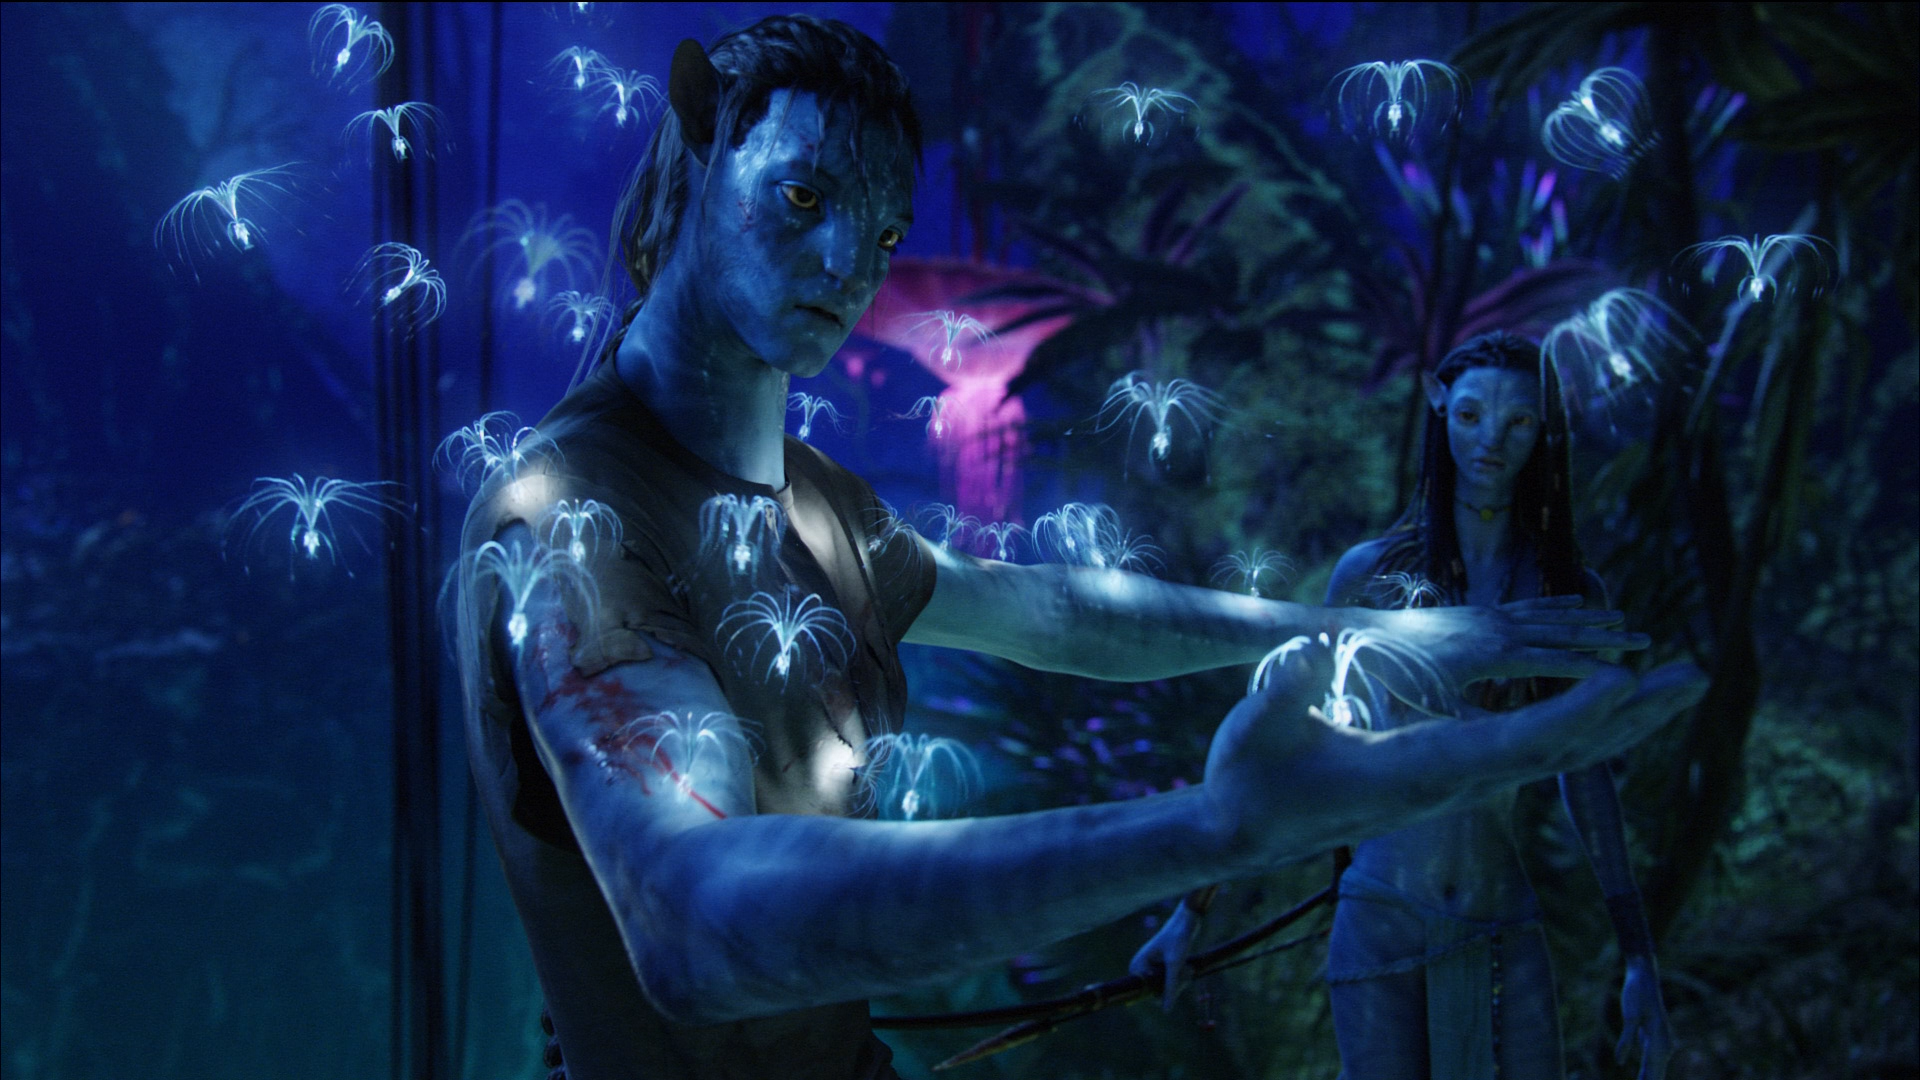 Original Avatar HD Wallpapers for All Avatar Wallpaper Fans